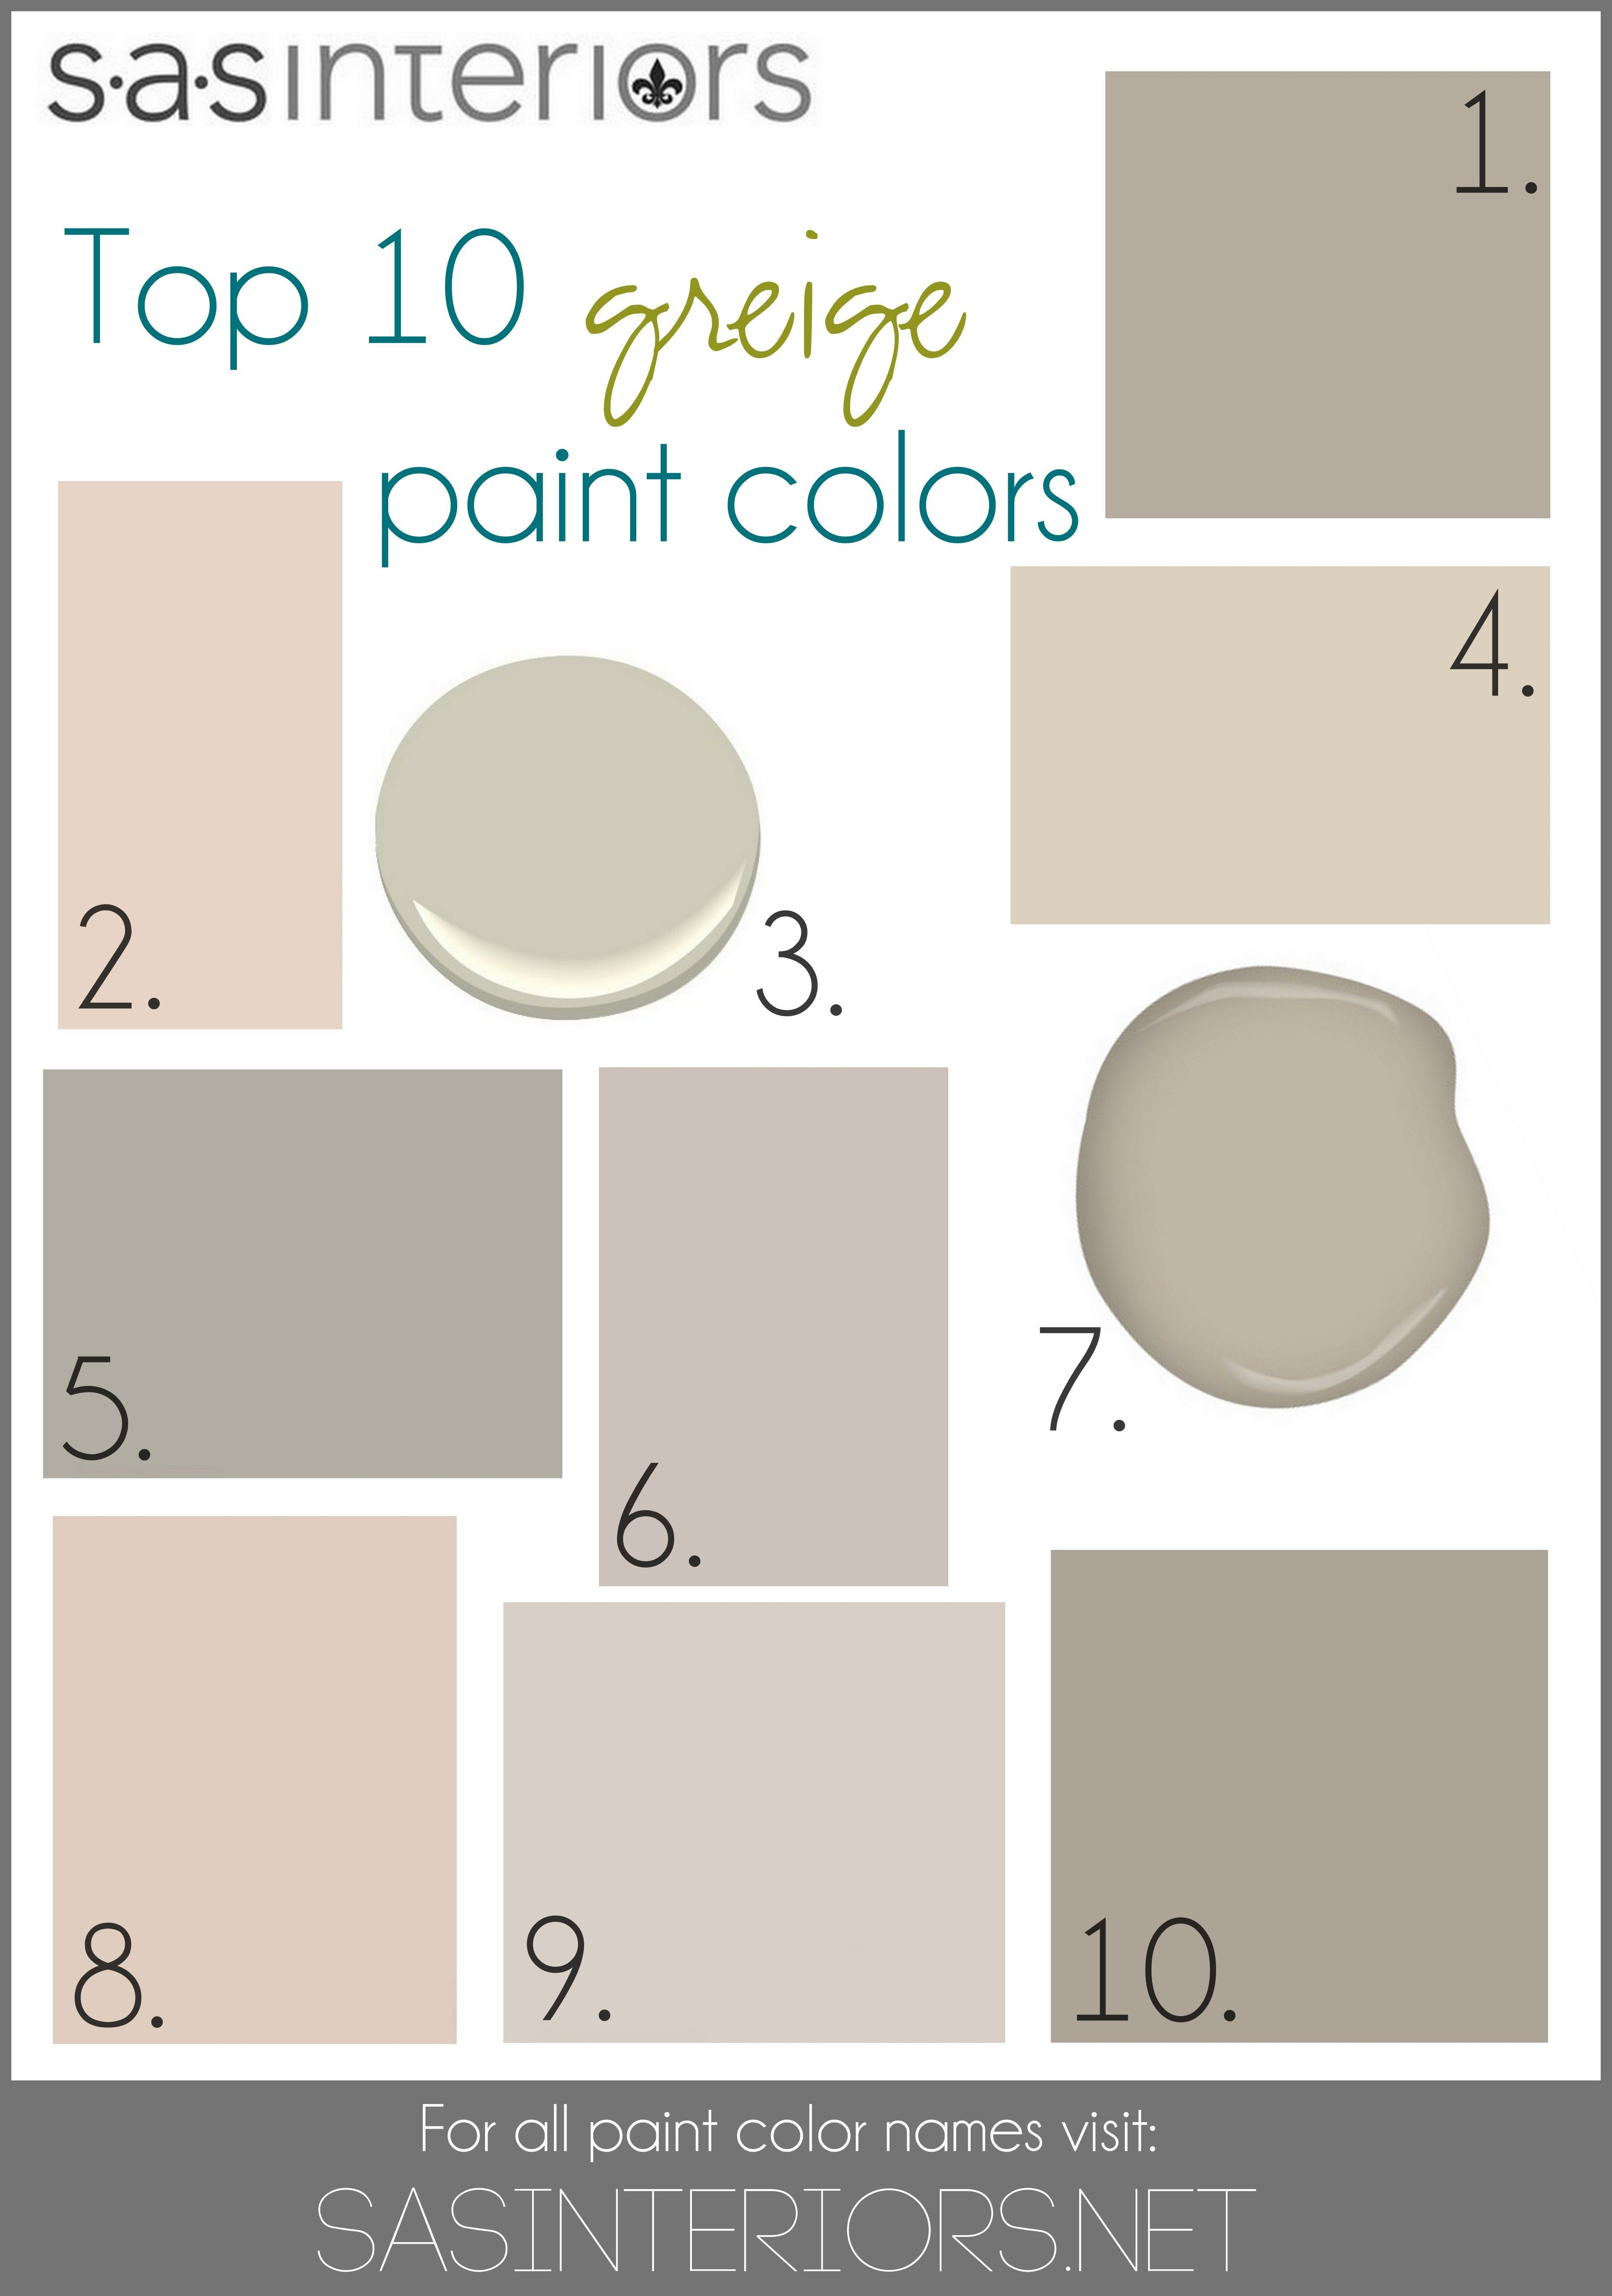 Top 10 Greige Paint Colors For Walls 1 Sherwin Williams Mega 2 Valspar Woodrow Wilson Putty 3 Benjamin Moore Hazy Skies 4